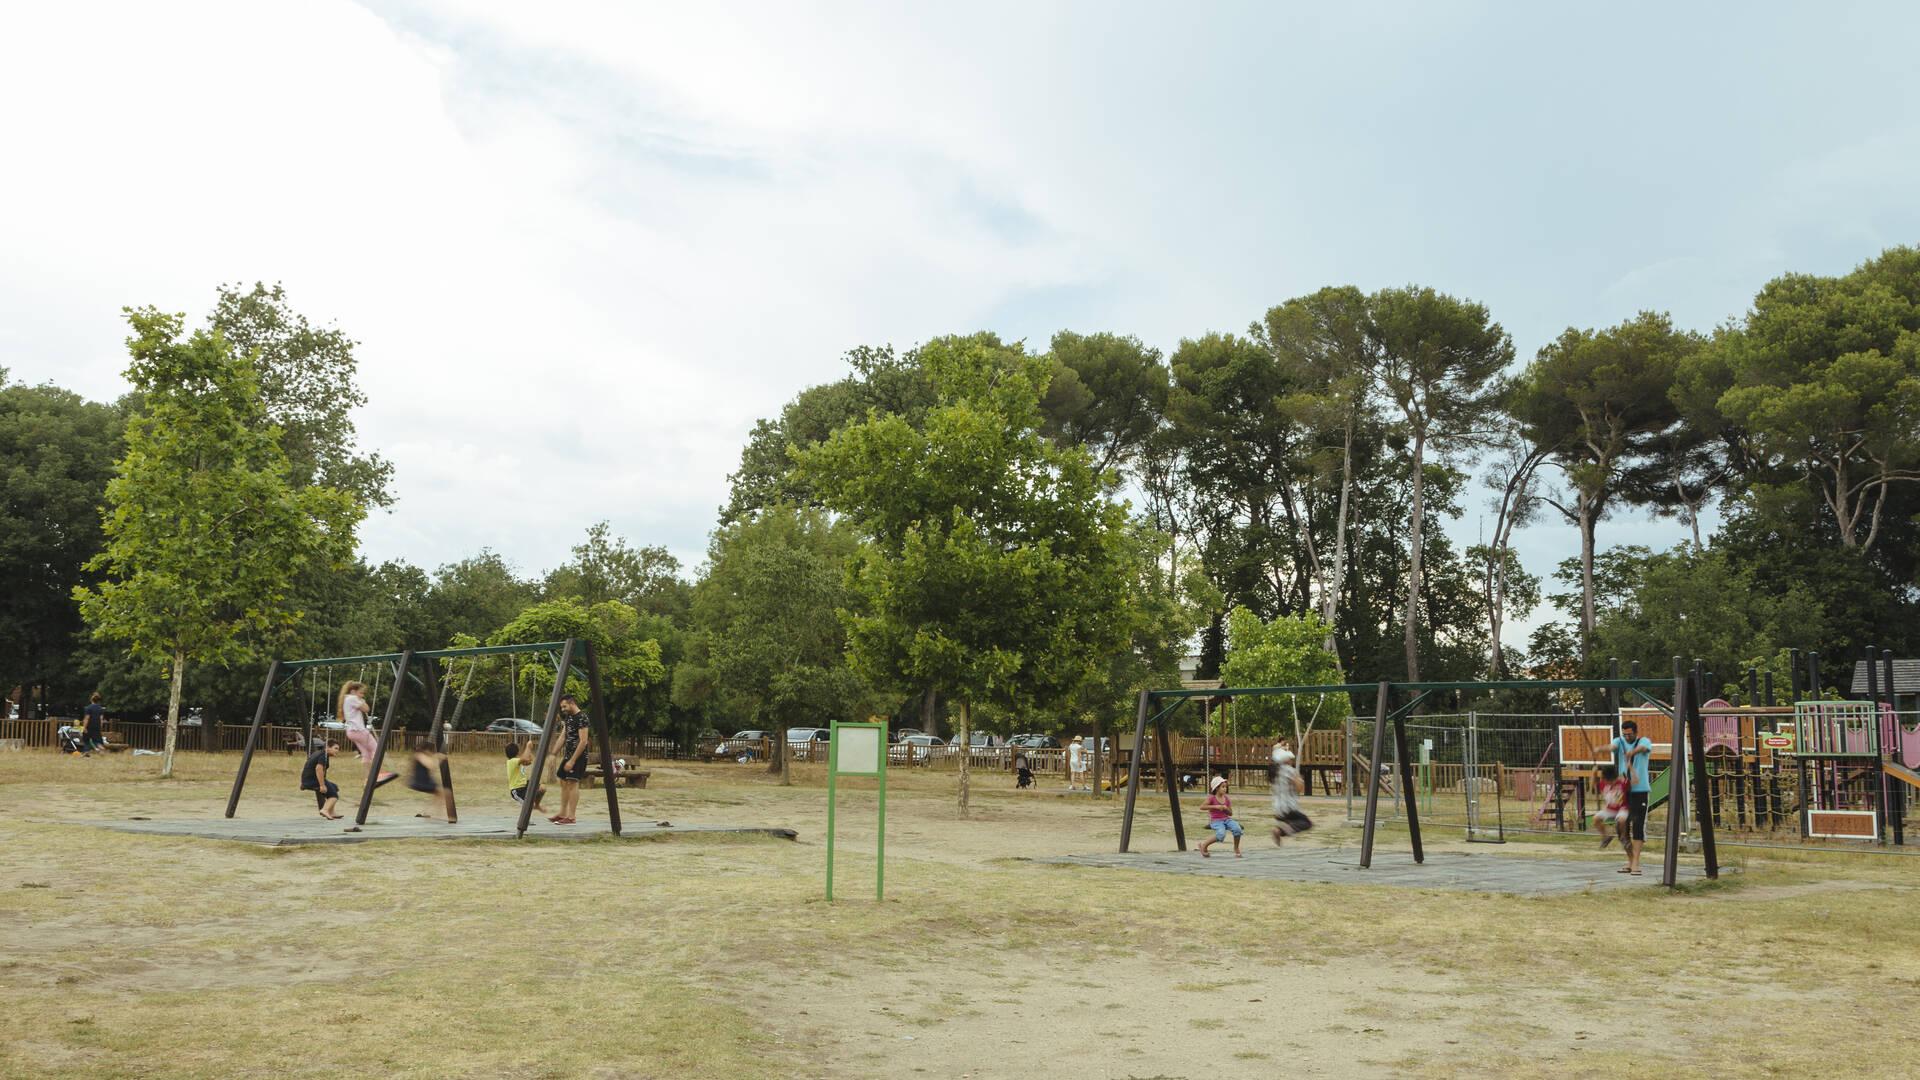 Il parco di Vaugrenier ©Gilles Lefrancq